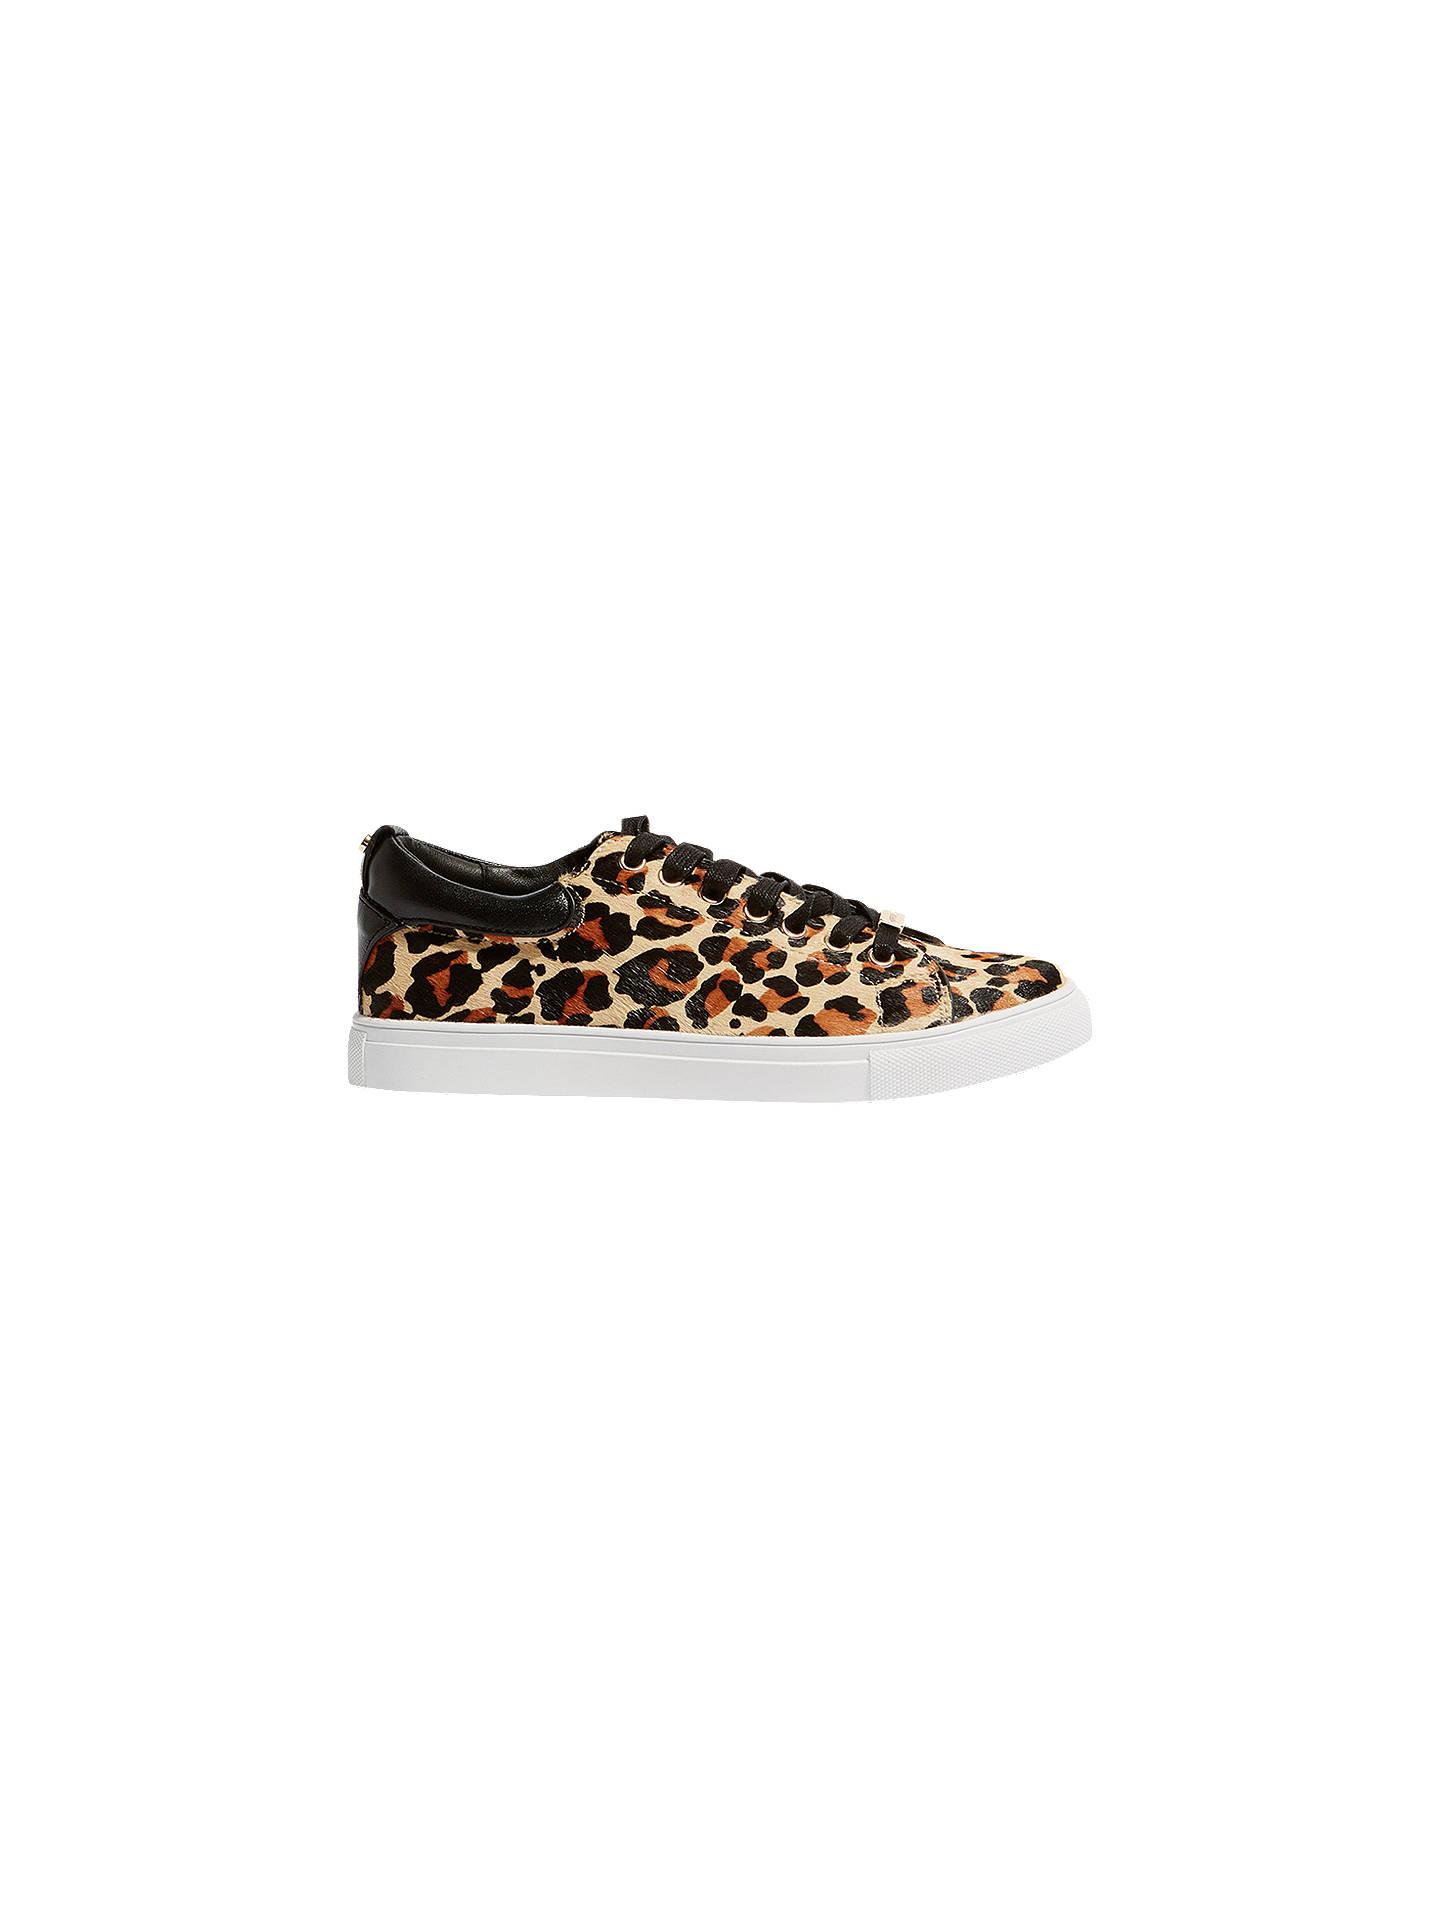 db99e04dad1b6 Buy Karen Millen Leather Leopard Print Trainers, Leopard, 3 Online at  johnlewis.com ...